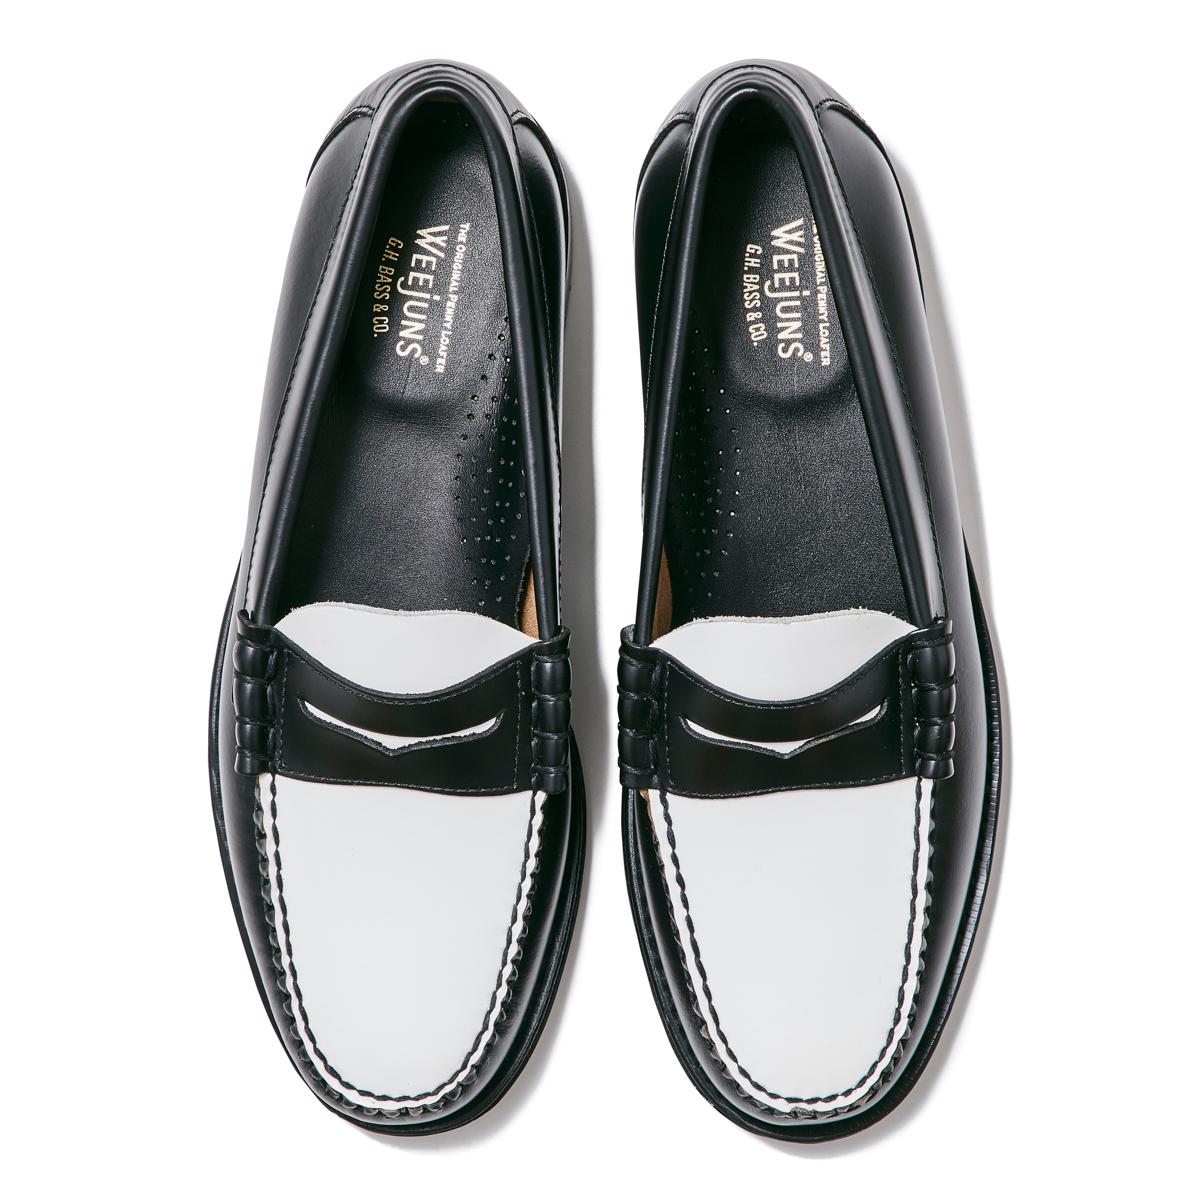 11010H LARSON / BLACK & WHITE (LEATHER SOLE)